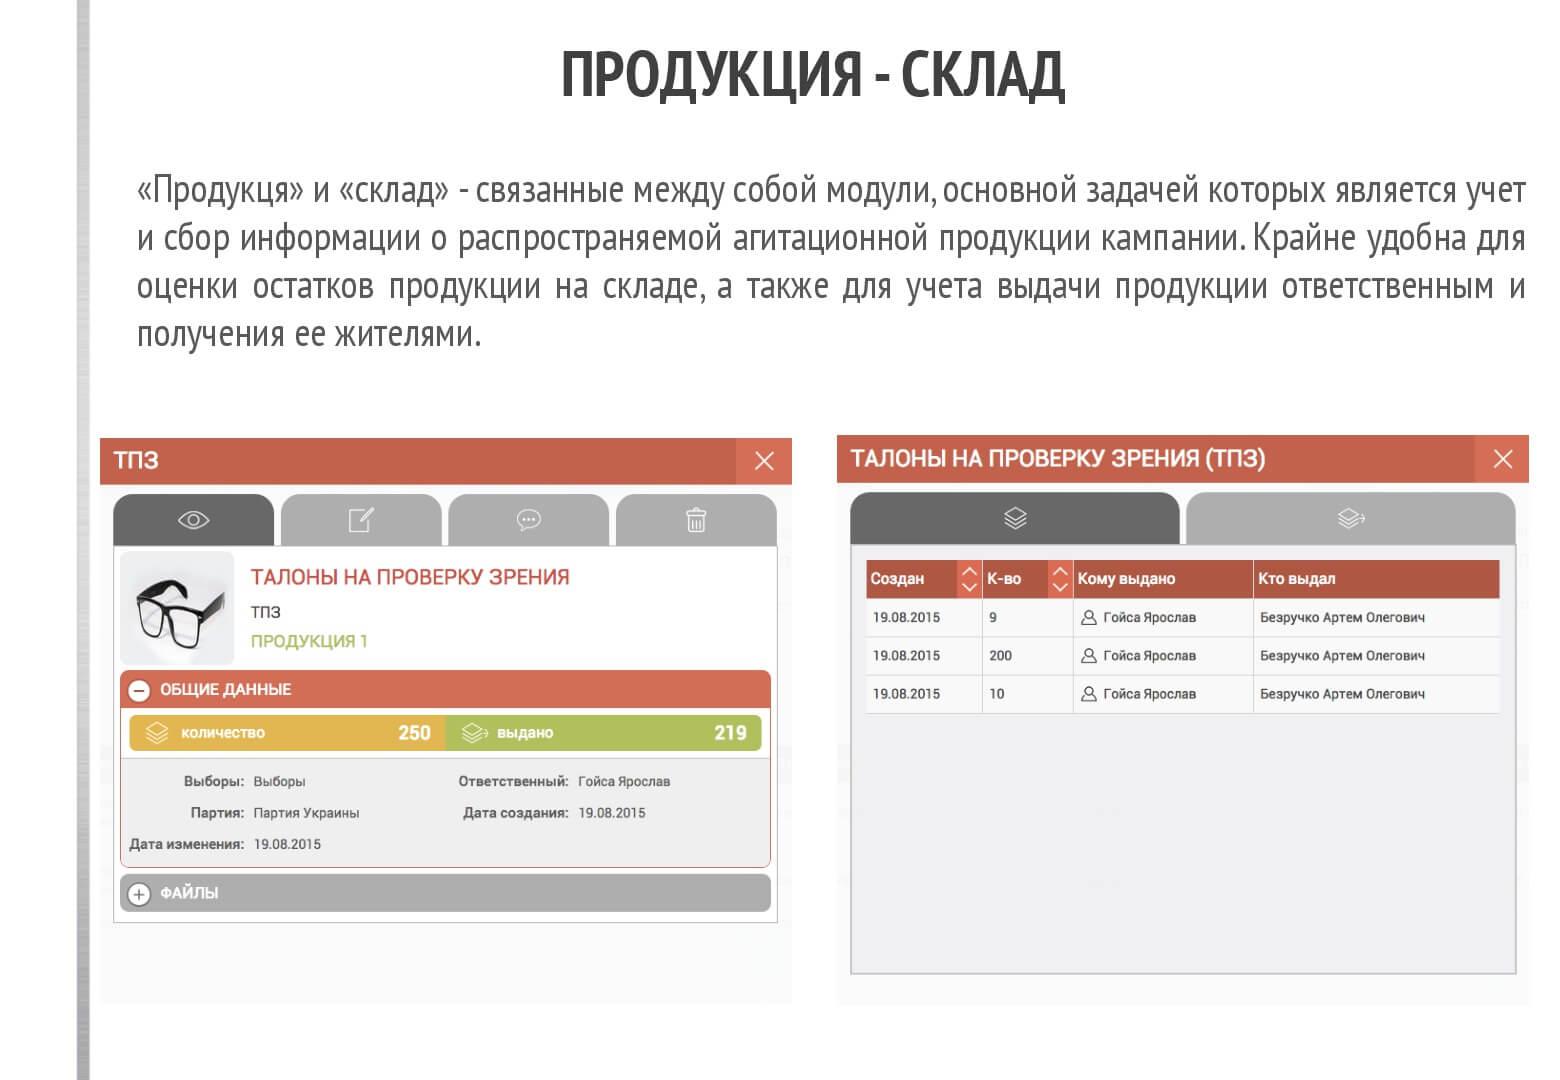 Elect.pro-BG-UA-016